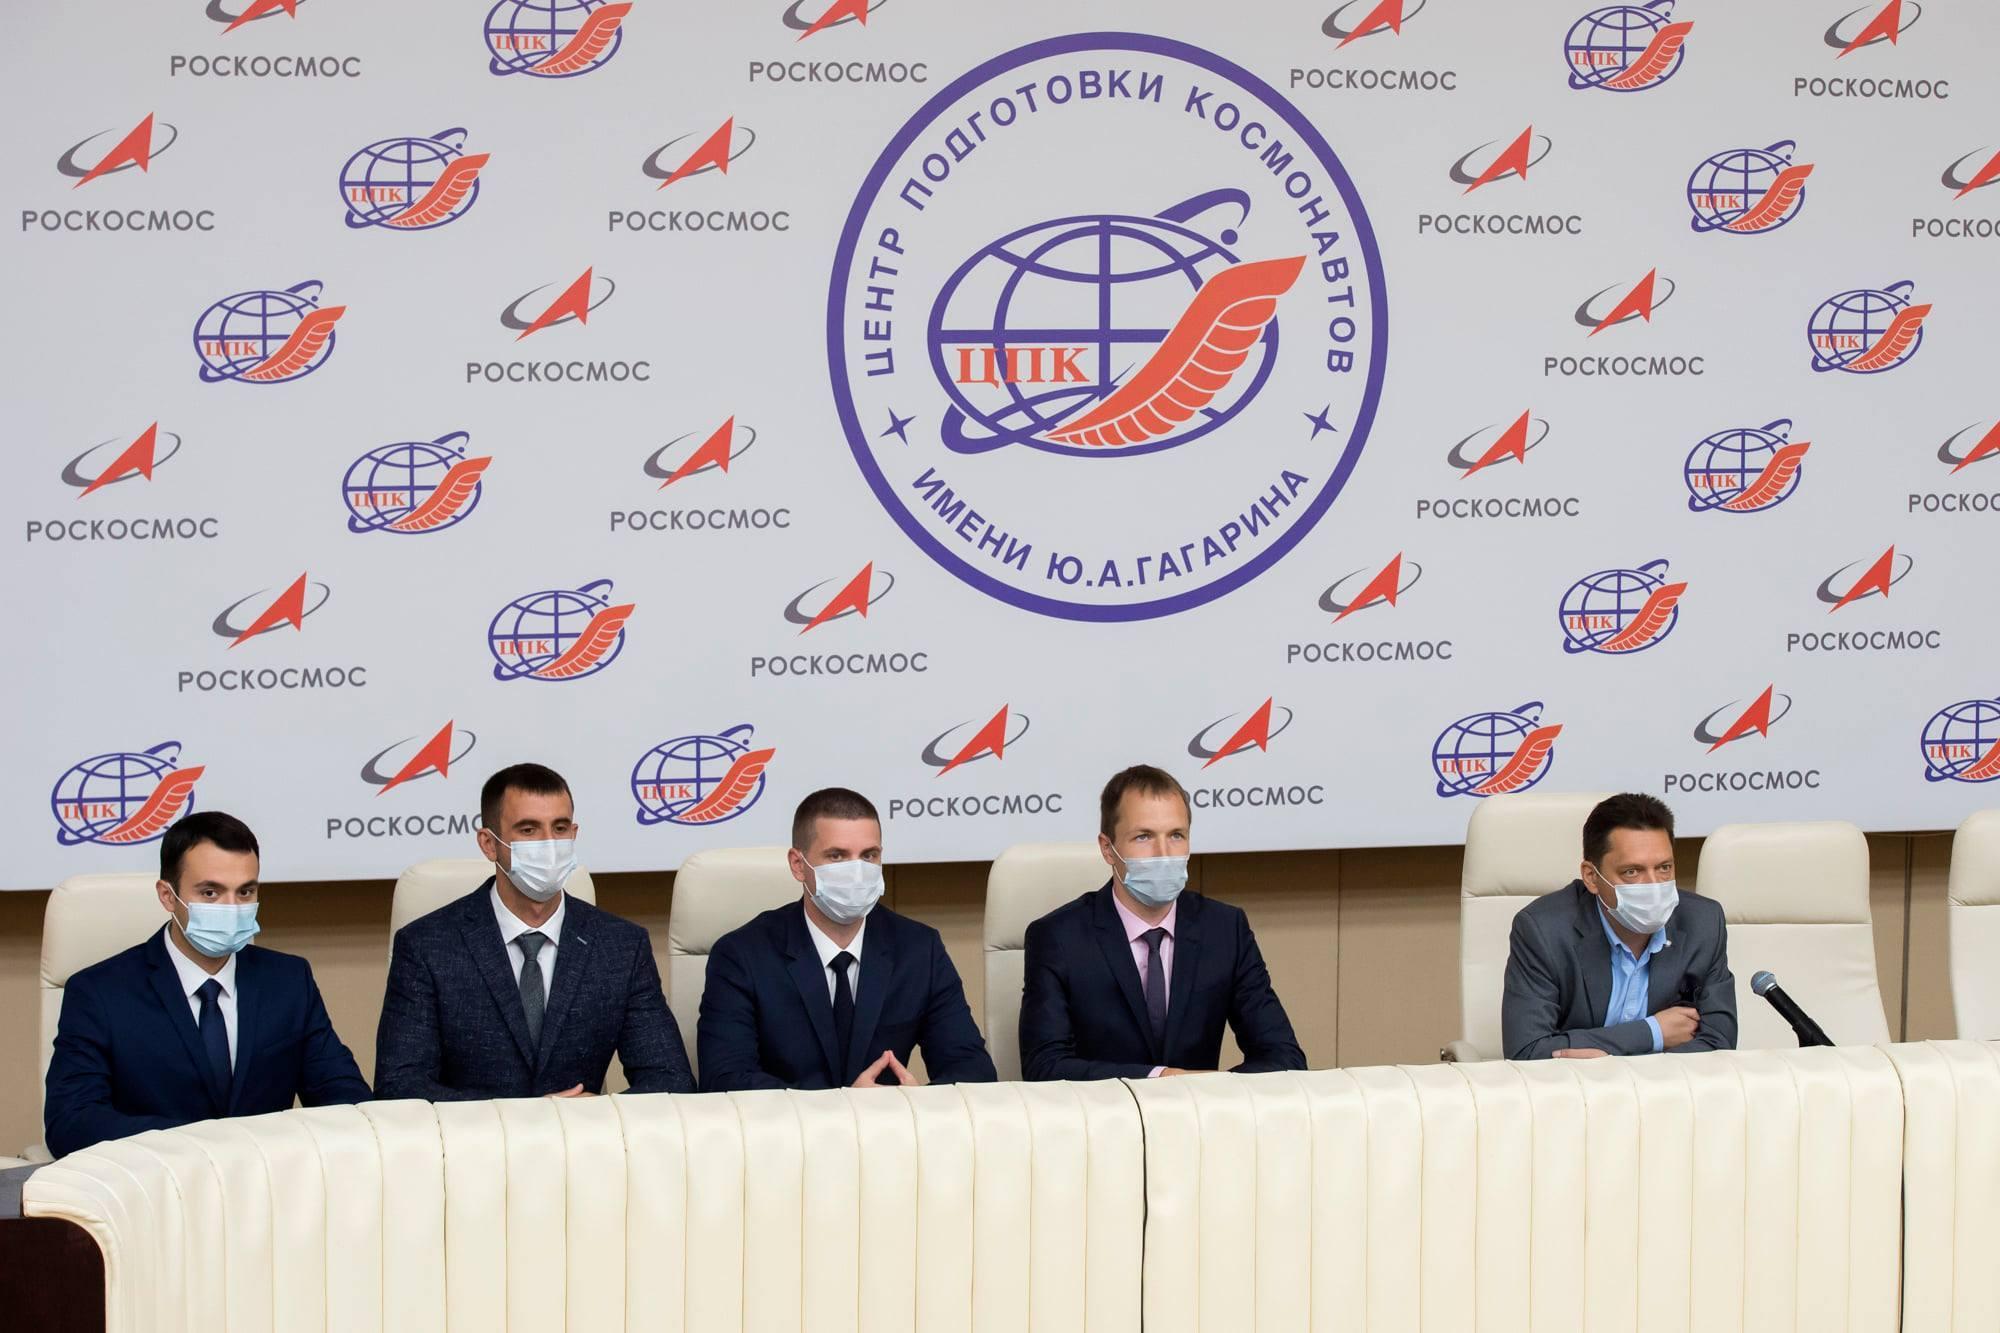 Les quatres nouvelles recrues en compagnie (à droite) du chef du TsPK, Maxime Kharlamov.